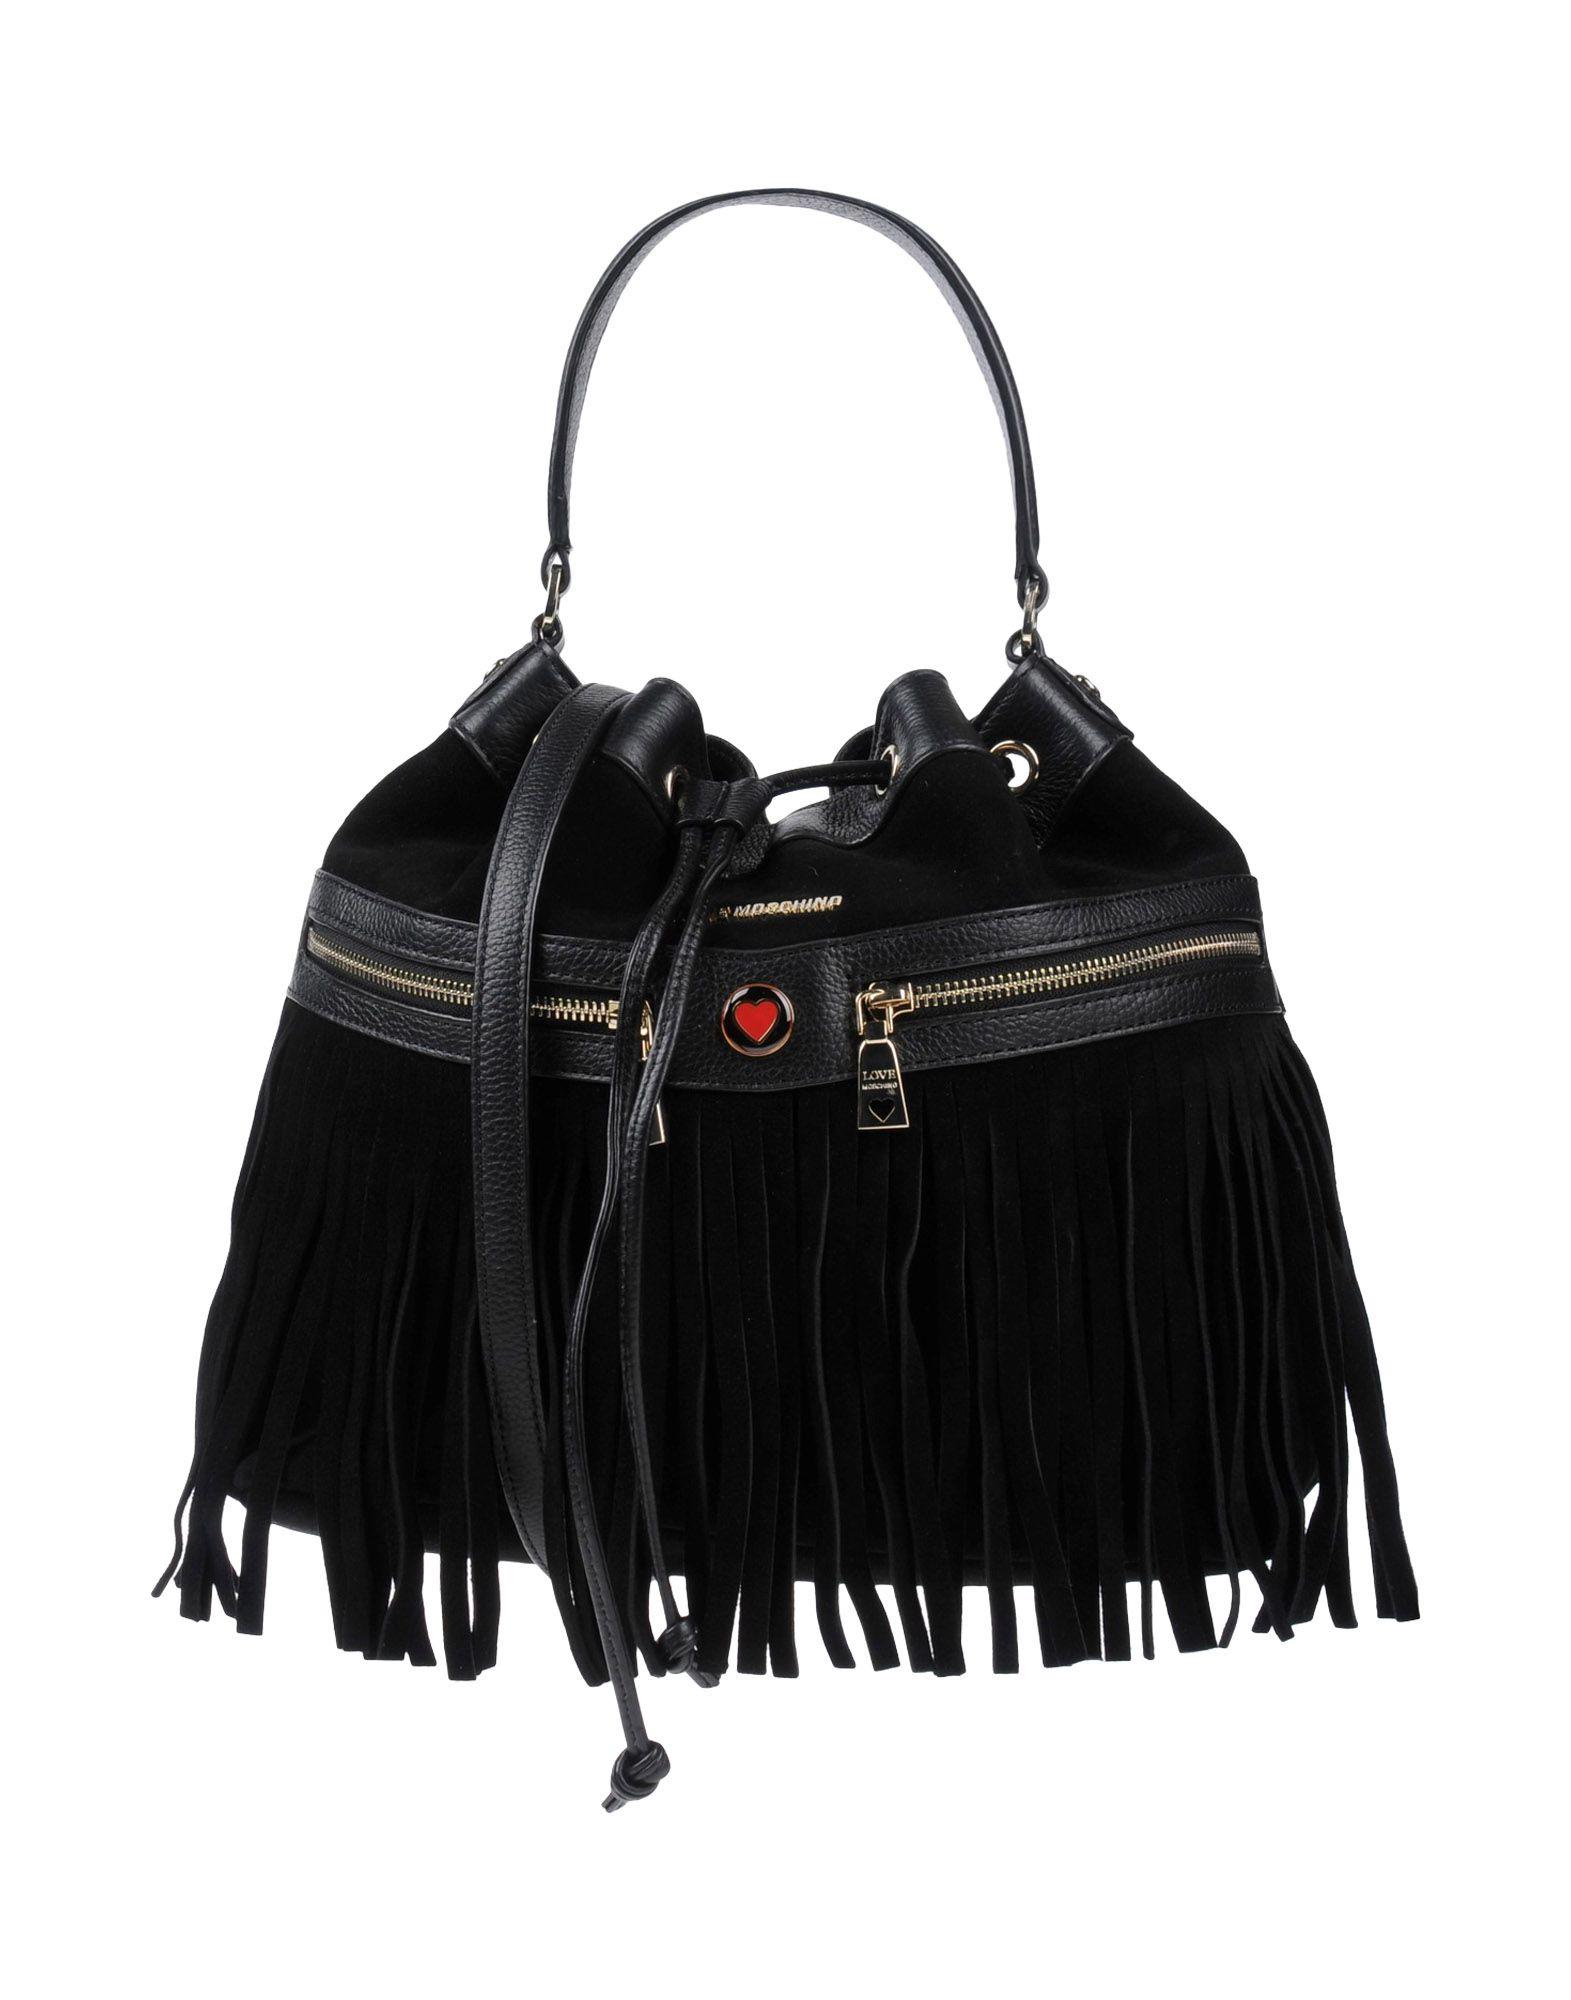 a937acf9ae4d Сумка на руку черного цвета Love Moschino за 24 500 руб. купить в ...